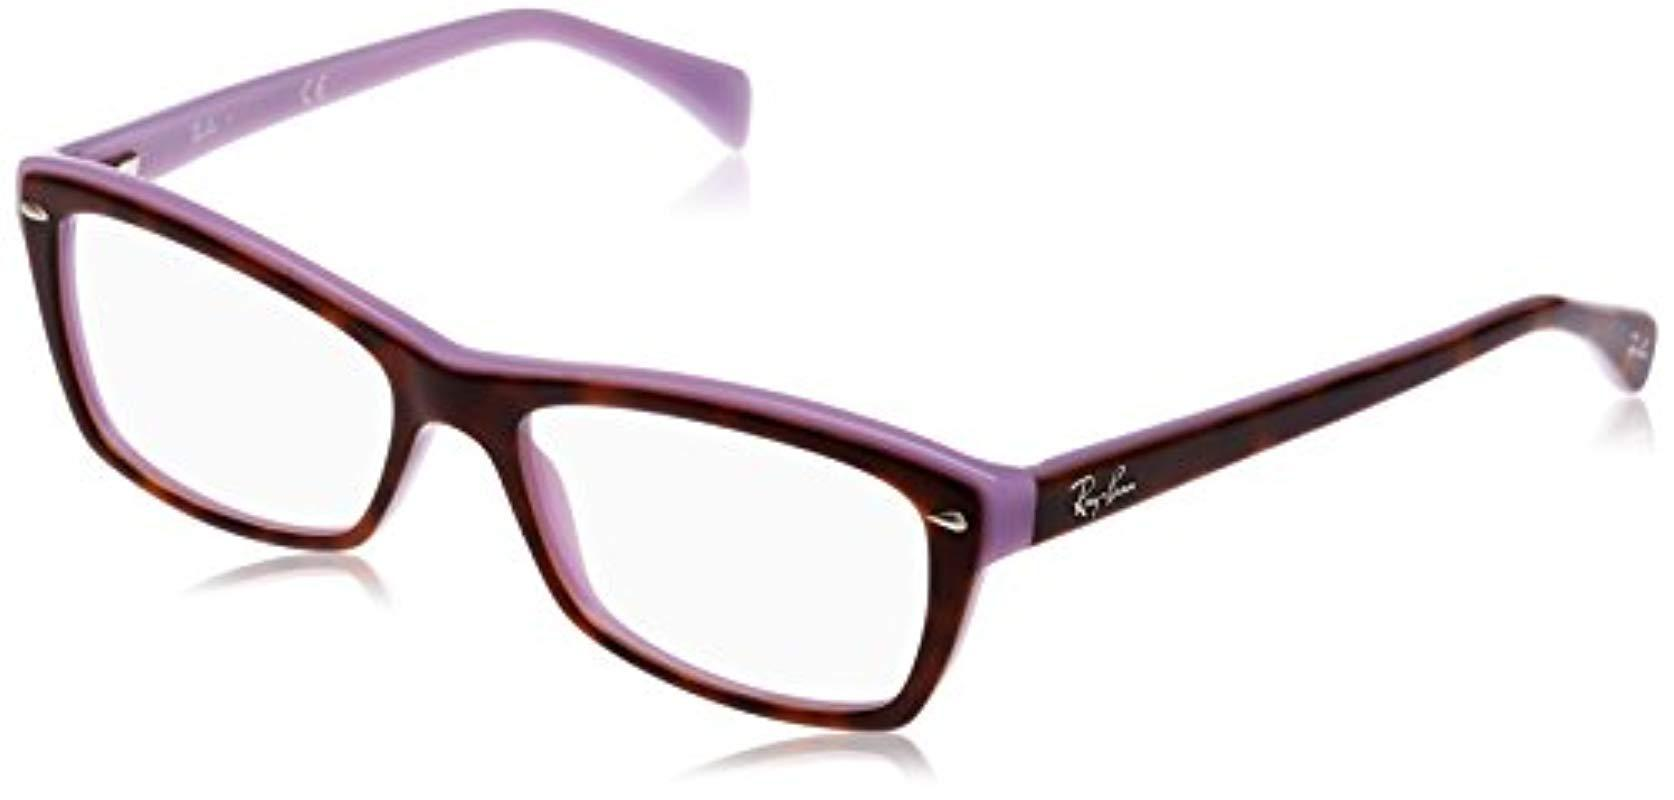 97ac37f0b87 Ray-Ban. Women s 0rx 5255 5240 53 Optical Frames ...